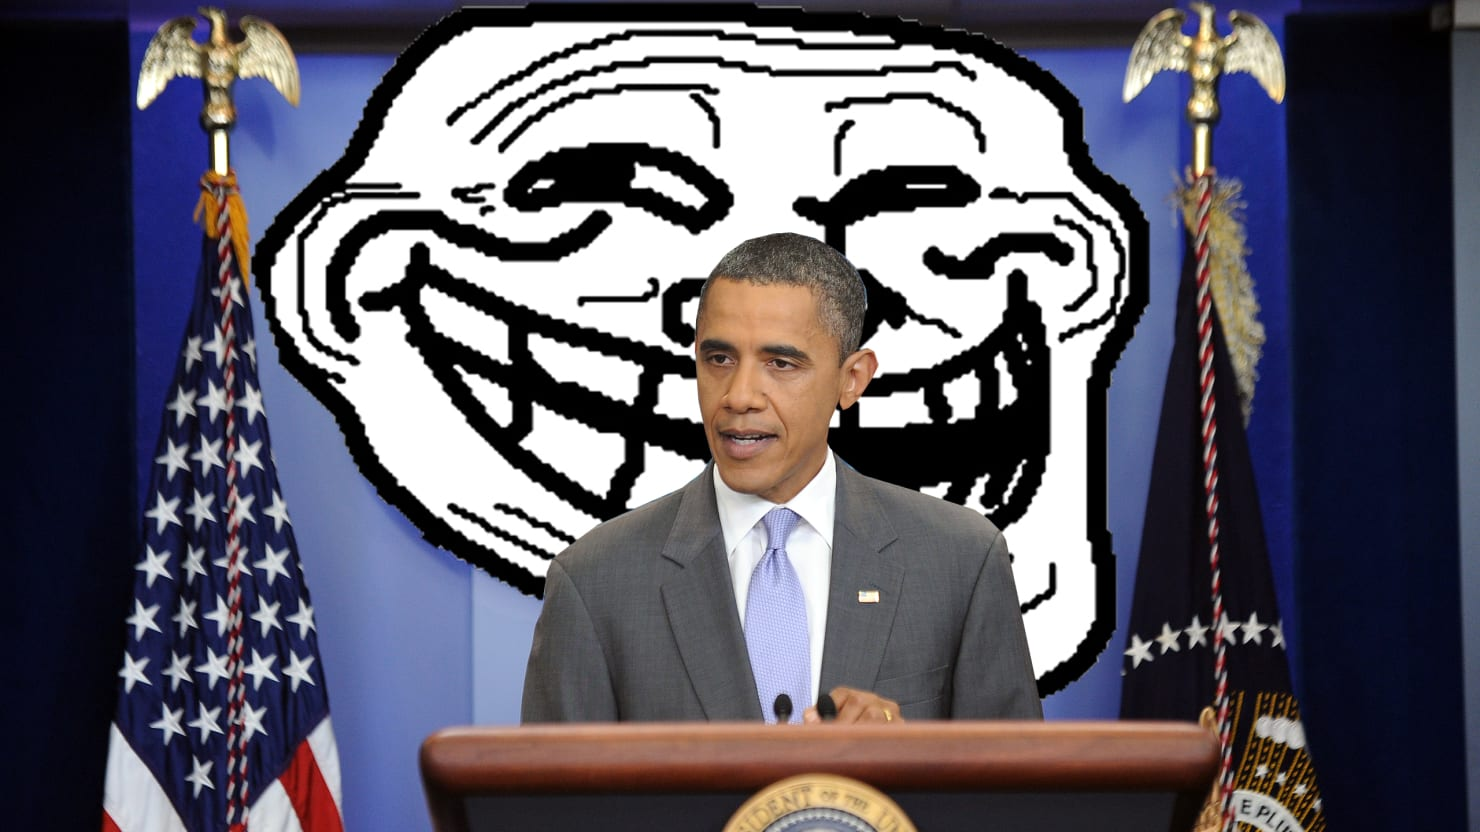 Can Internet Trolls Take Down Obamacare?